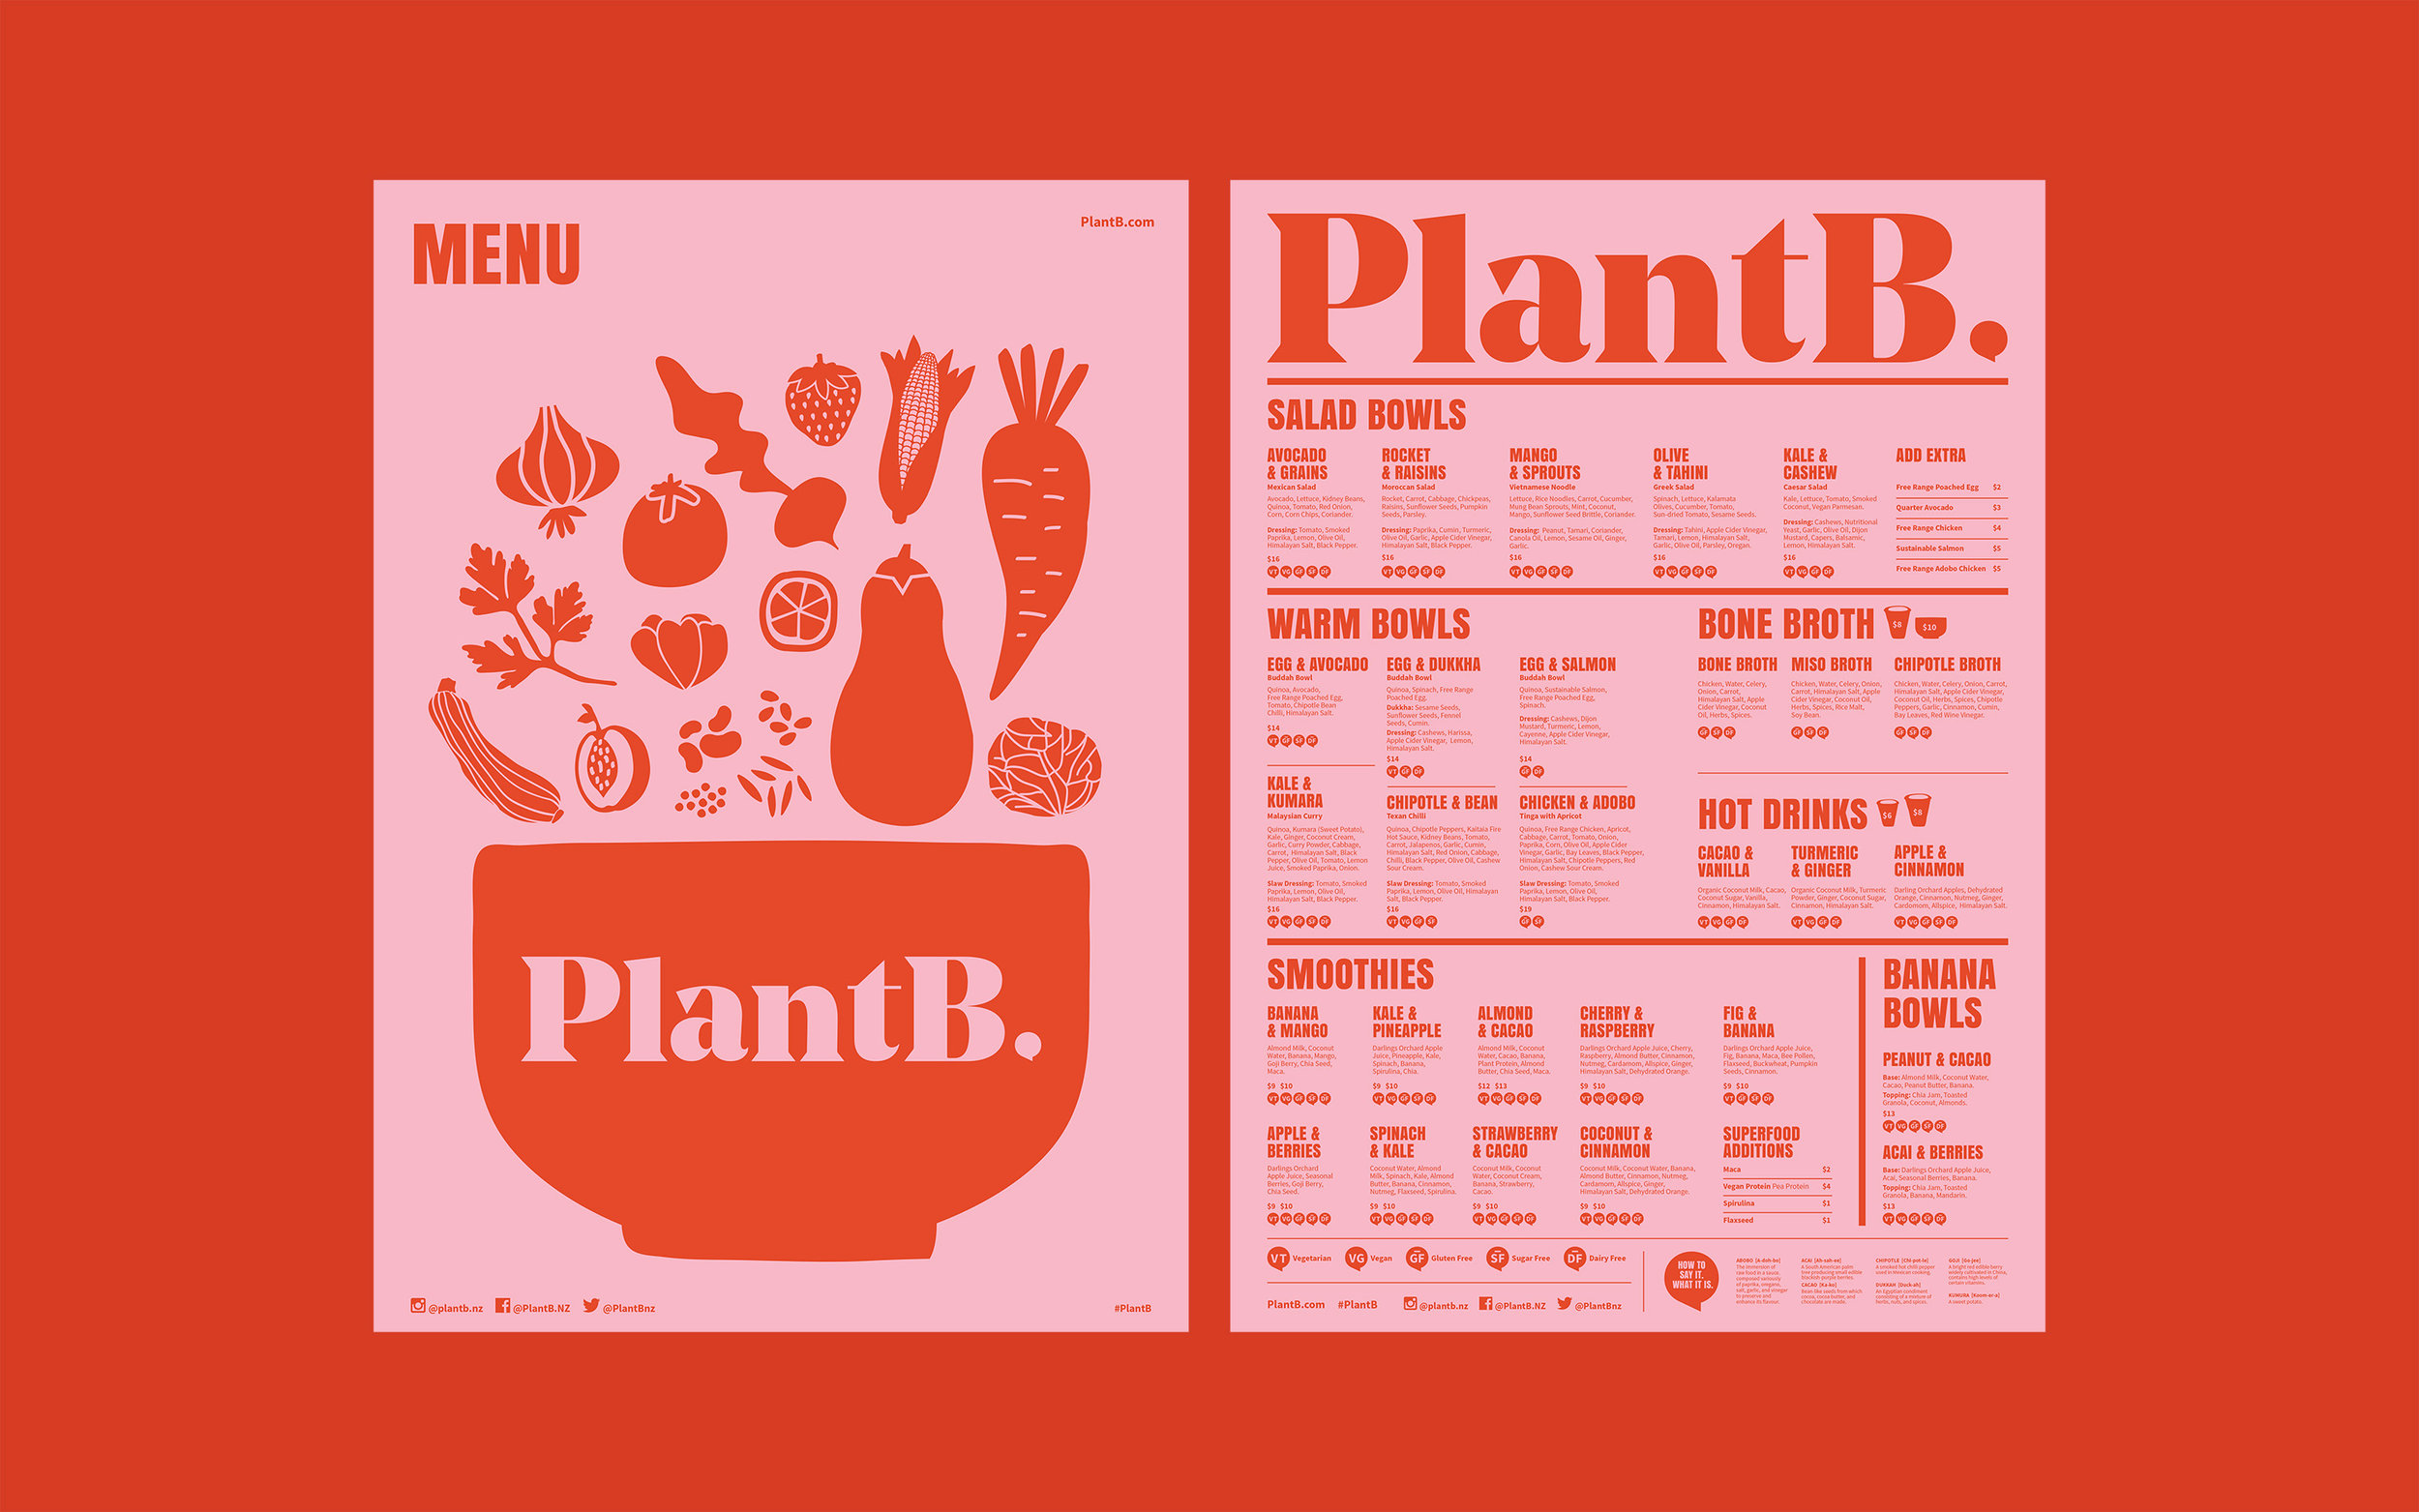 Presenatation-PlantB-9.jpg